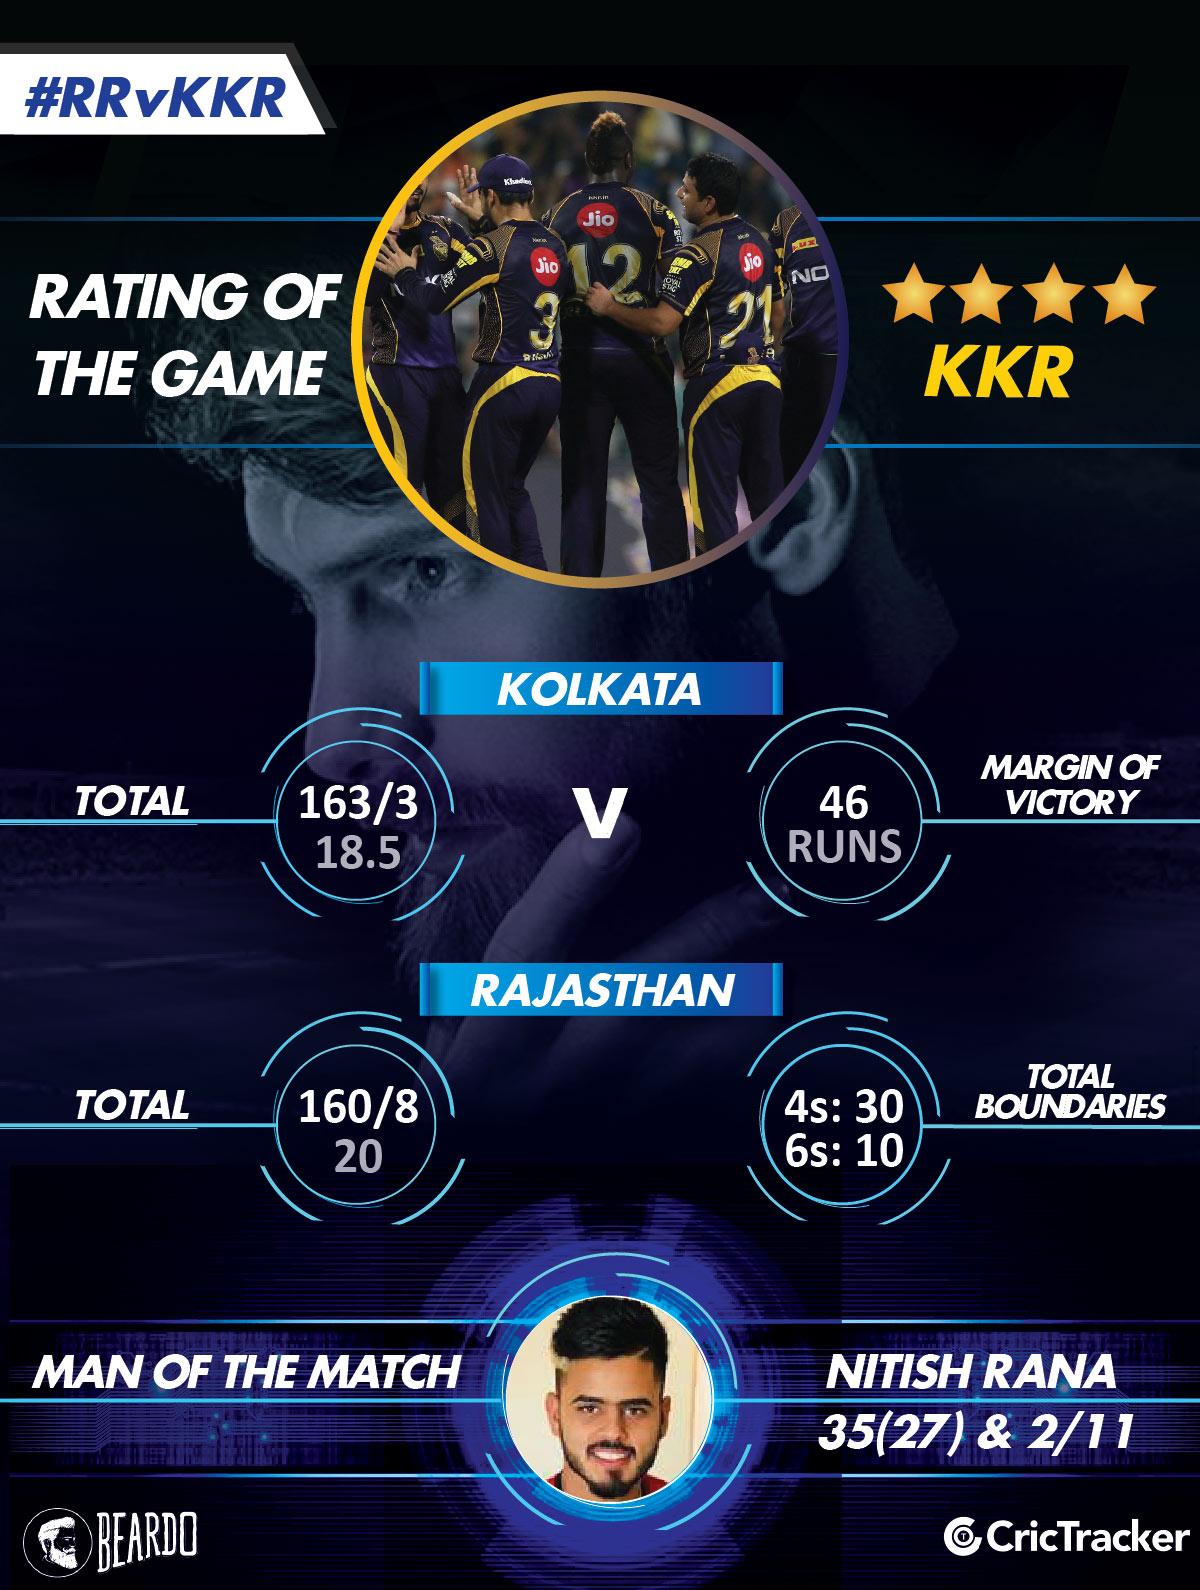 IPL2018-RRvKKR-RatinG